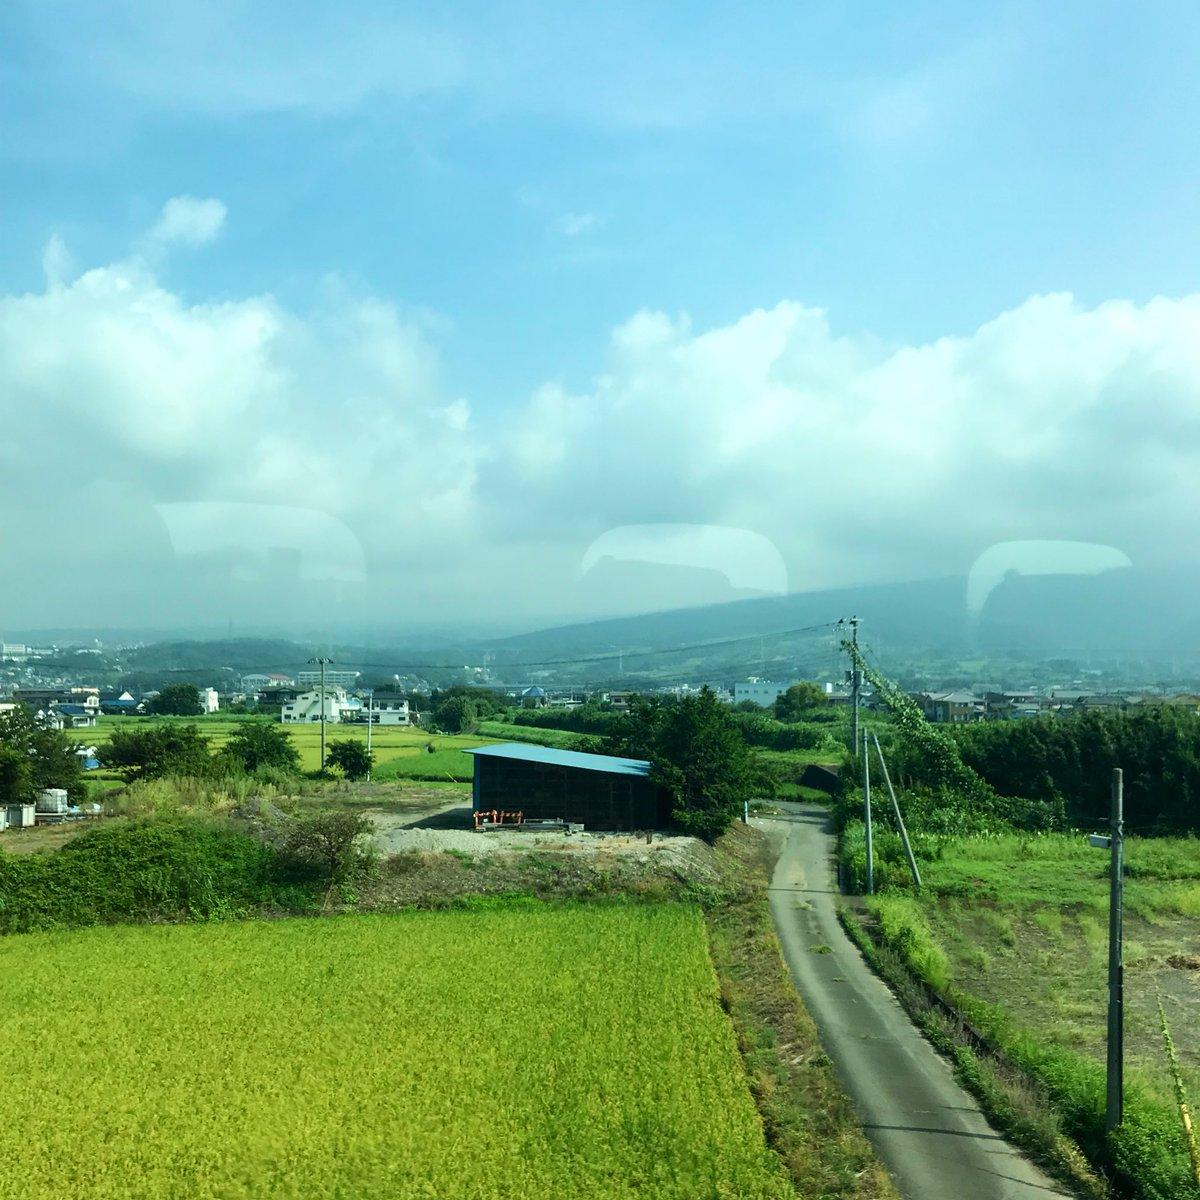 test ツイッターメディア - グリーン車で帰省〜。いつも走ってる東名高速を眺めながら、、なんて優雅なんだ…… https://t.co/g0HUNStSsQ